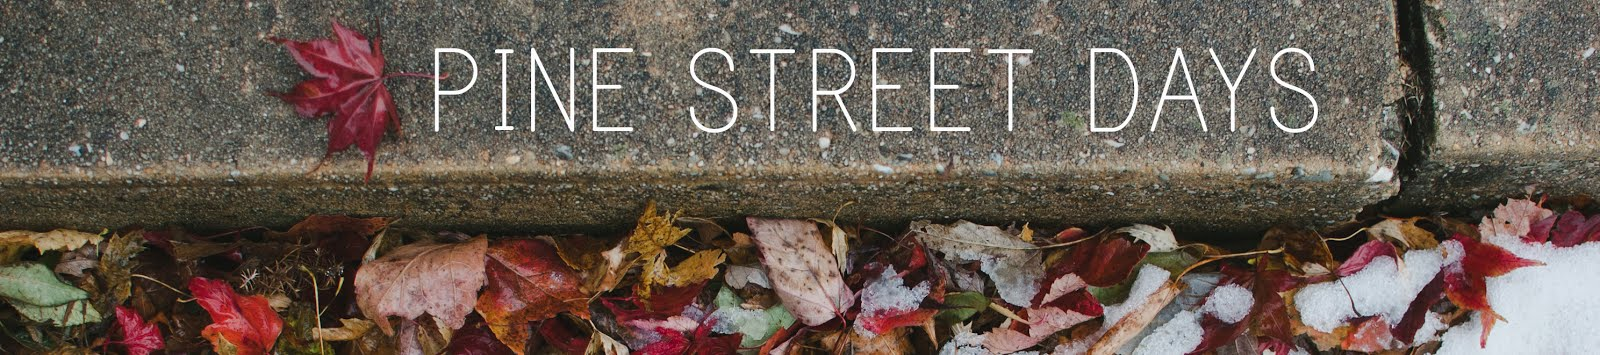 Pine Street Days